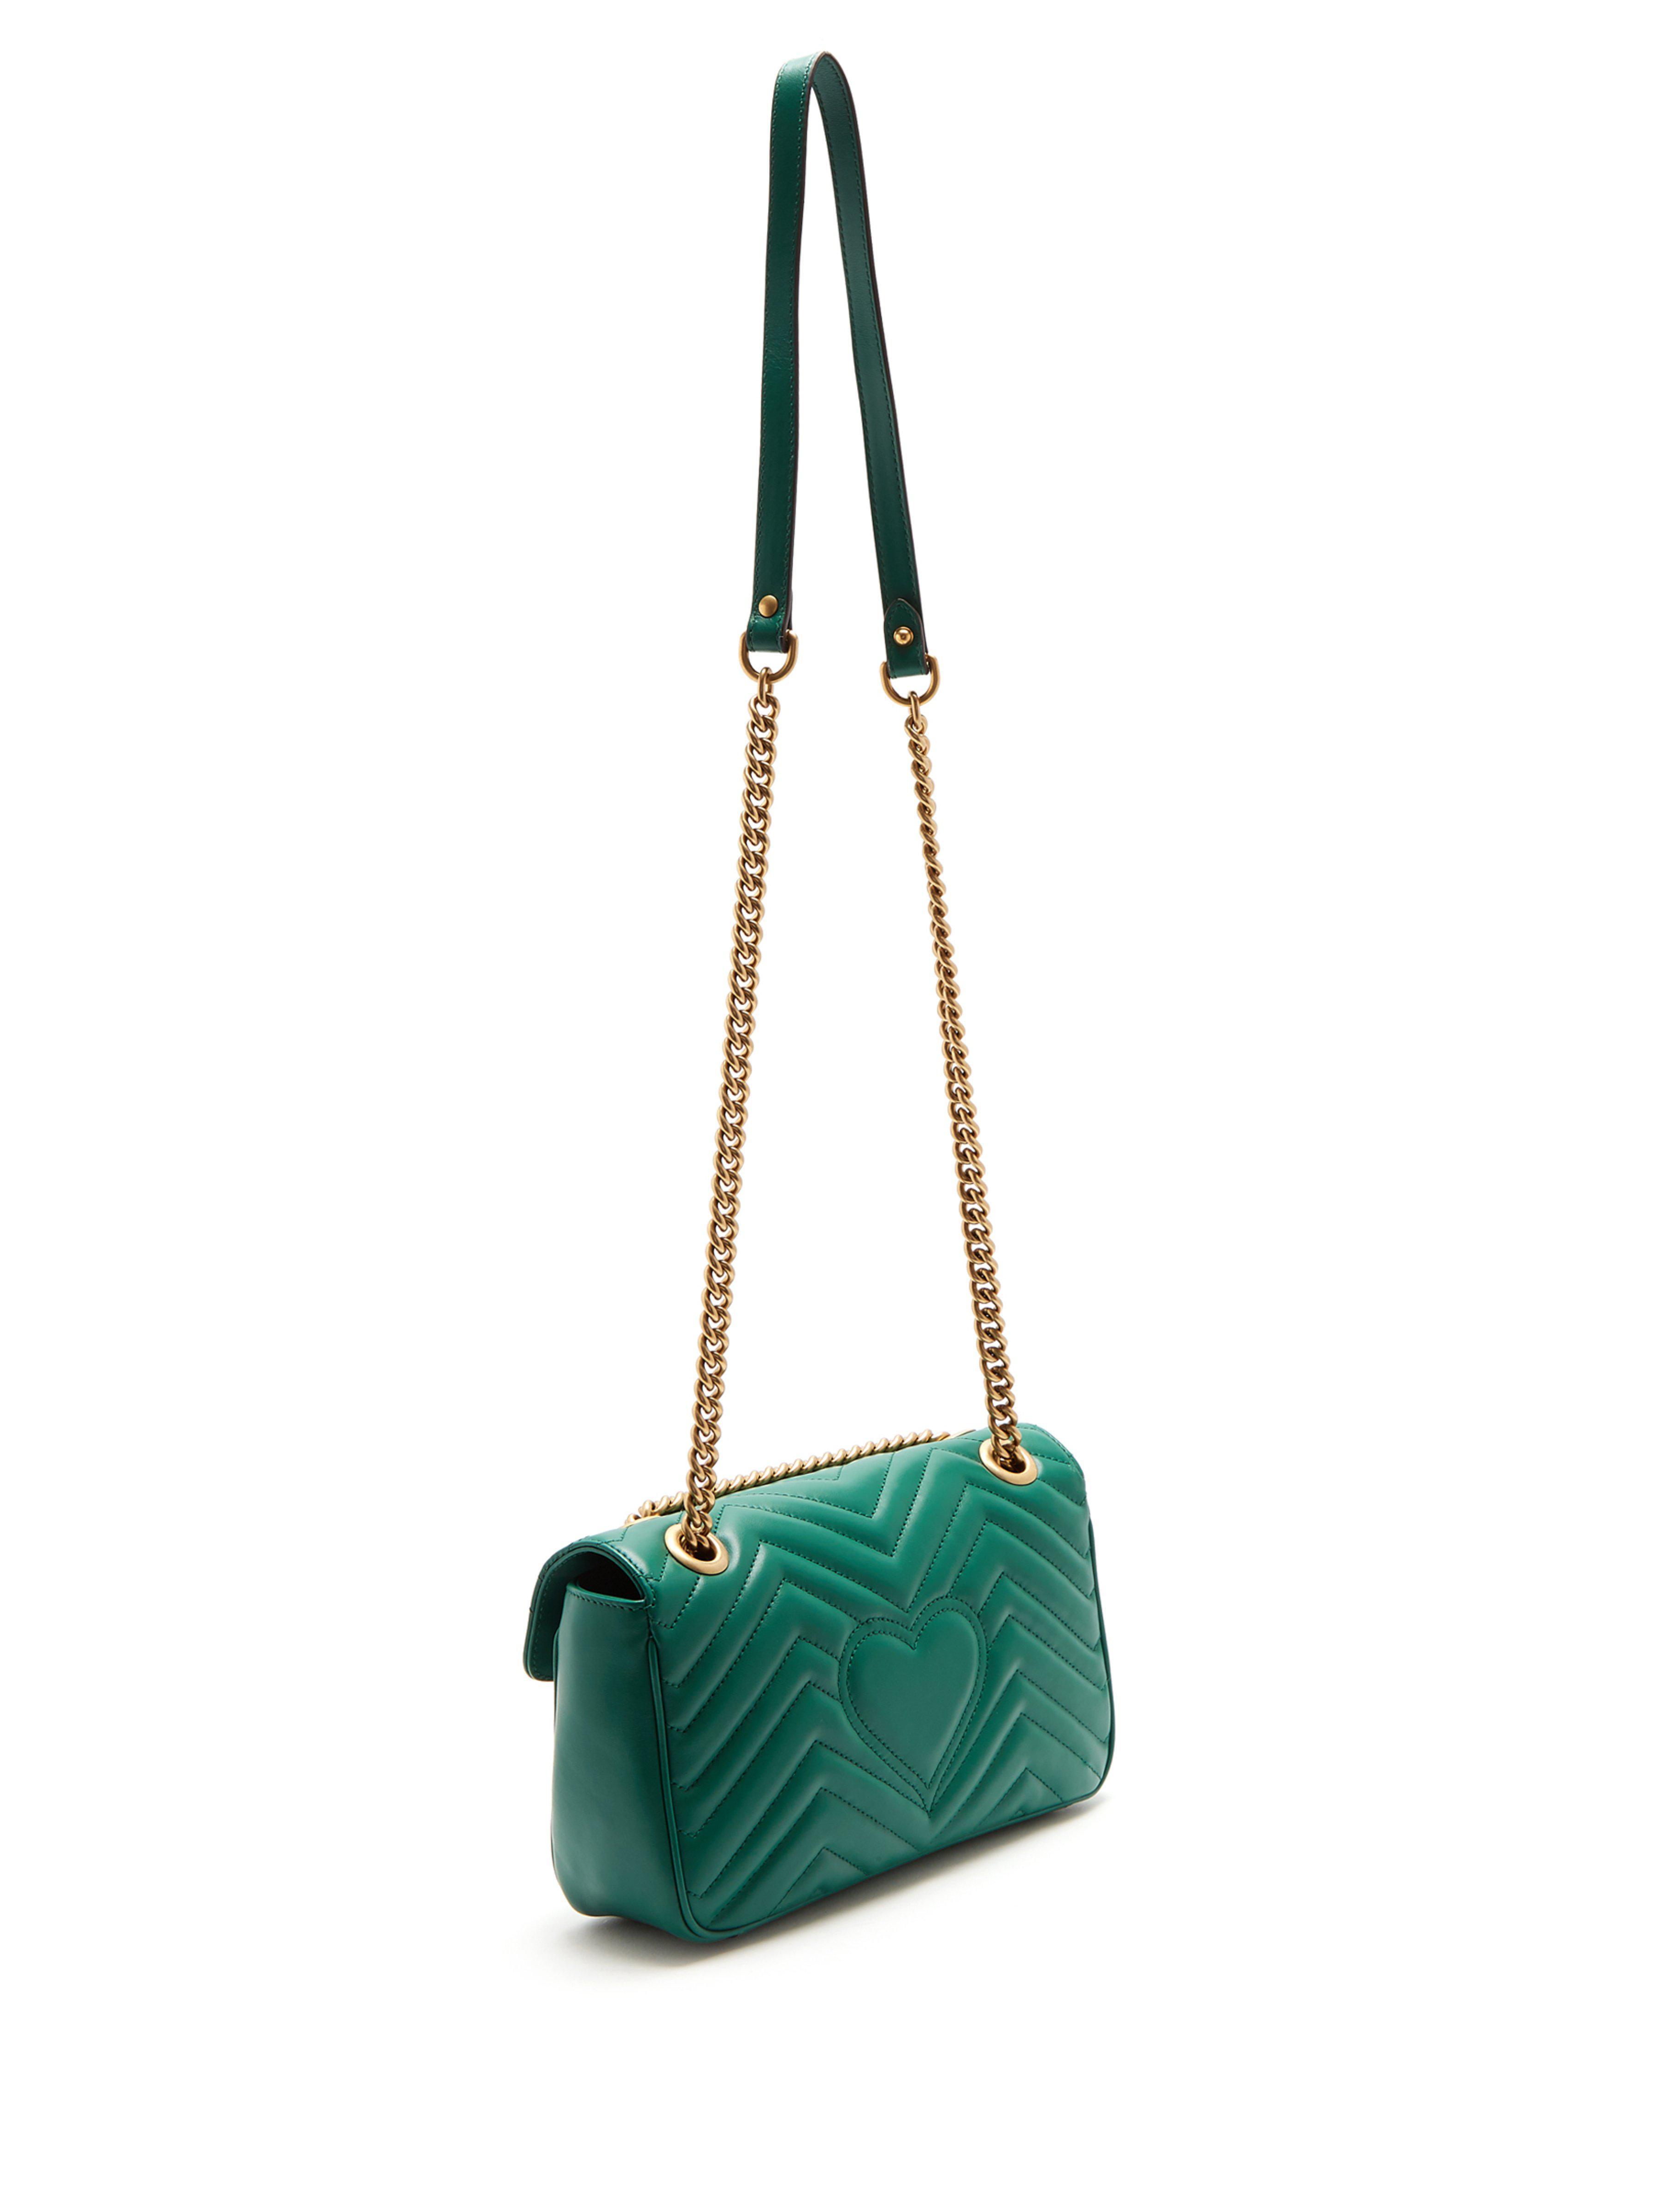 6c1fdaab0791 Gucci - Green Small Marmont Matelasse Leather Shoulder Bag - Lyst. View  fullscreen